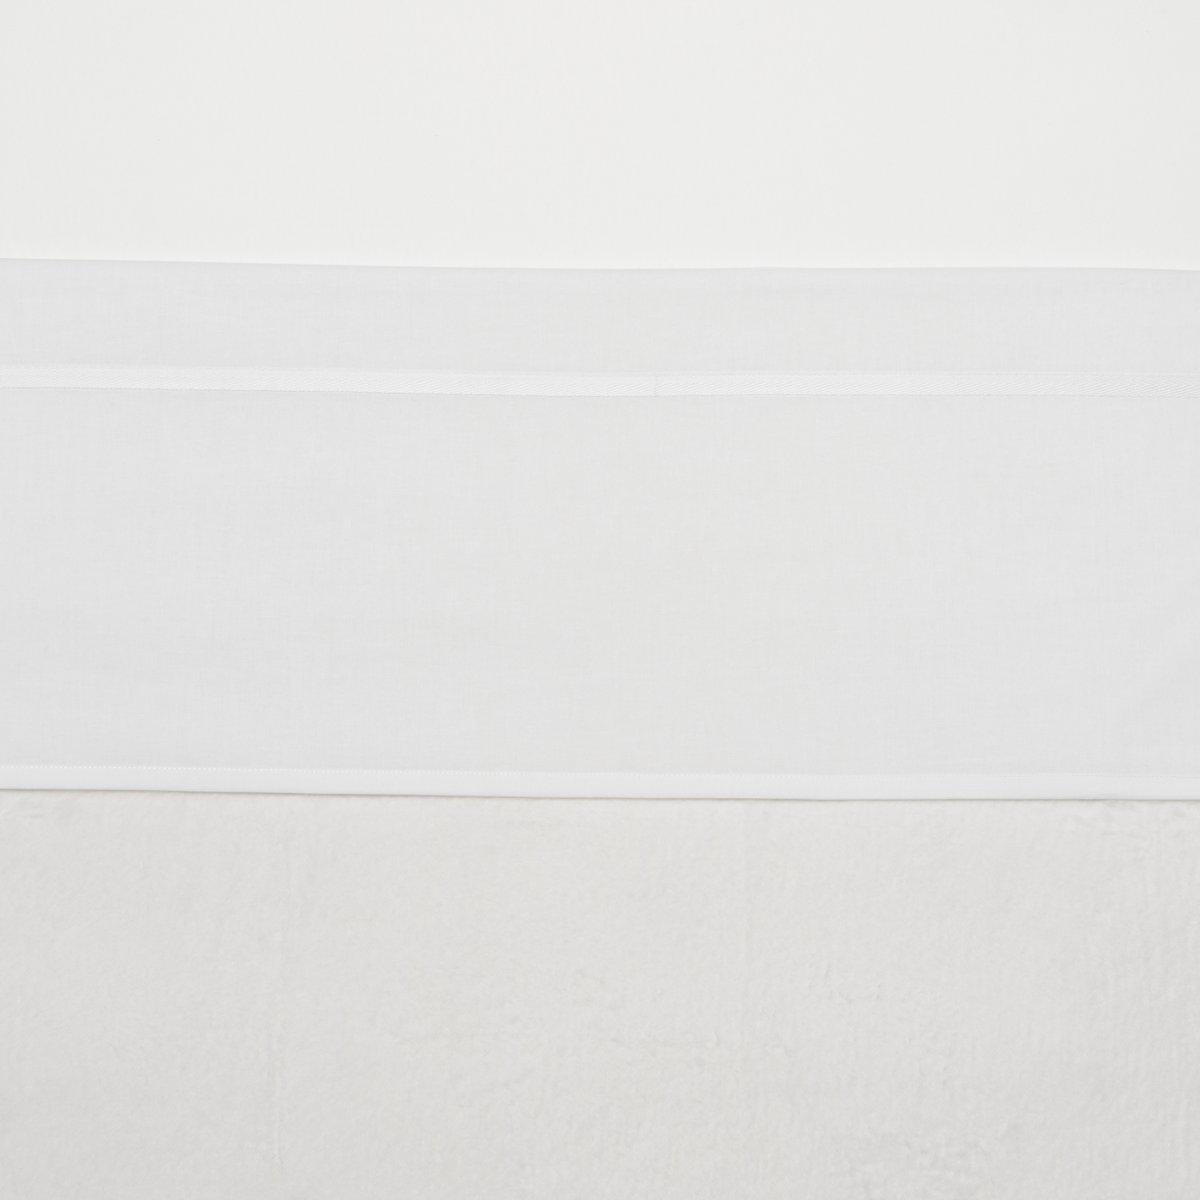 Meyco ledikantlaken wit met bies -  100 x 150 cm - Wit